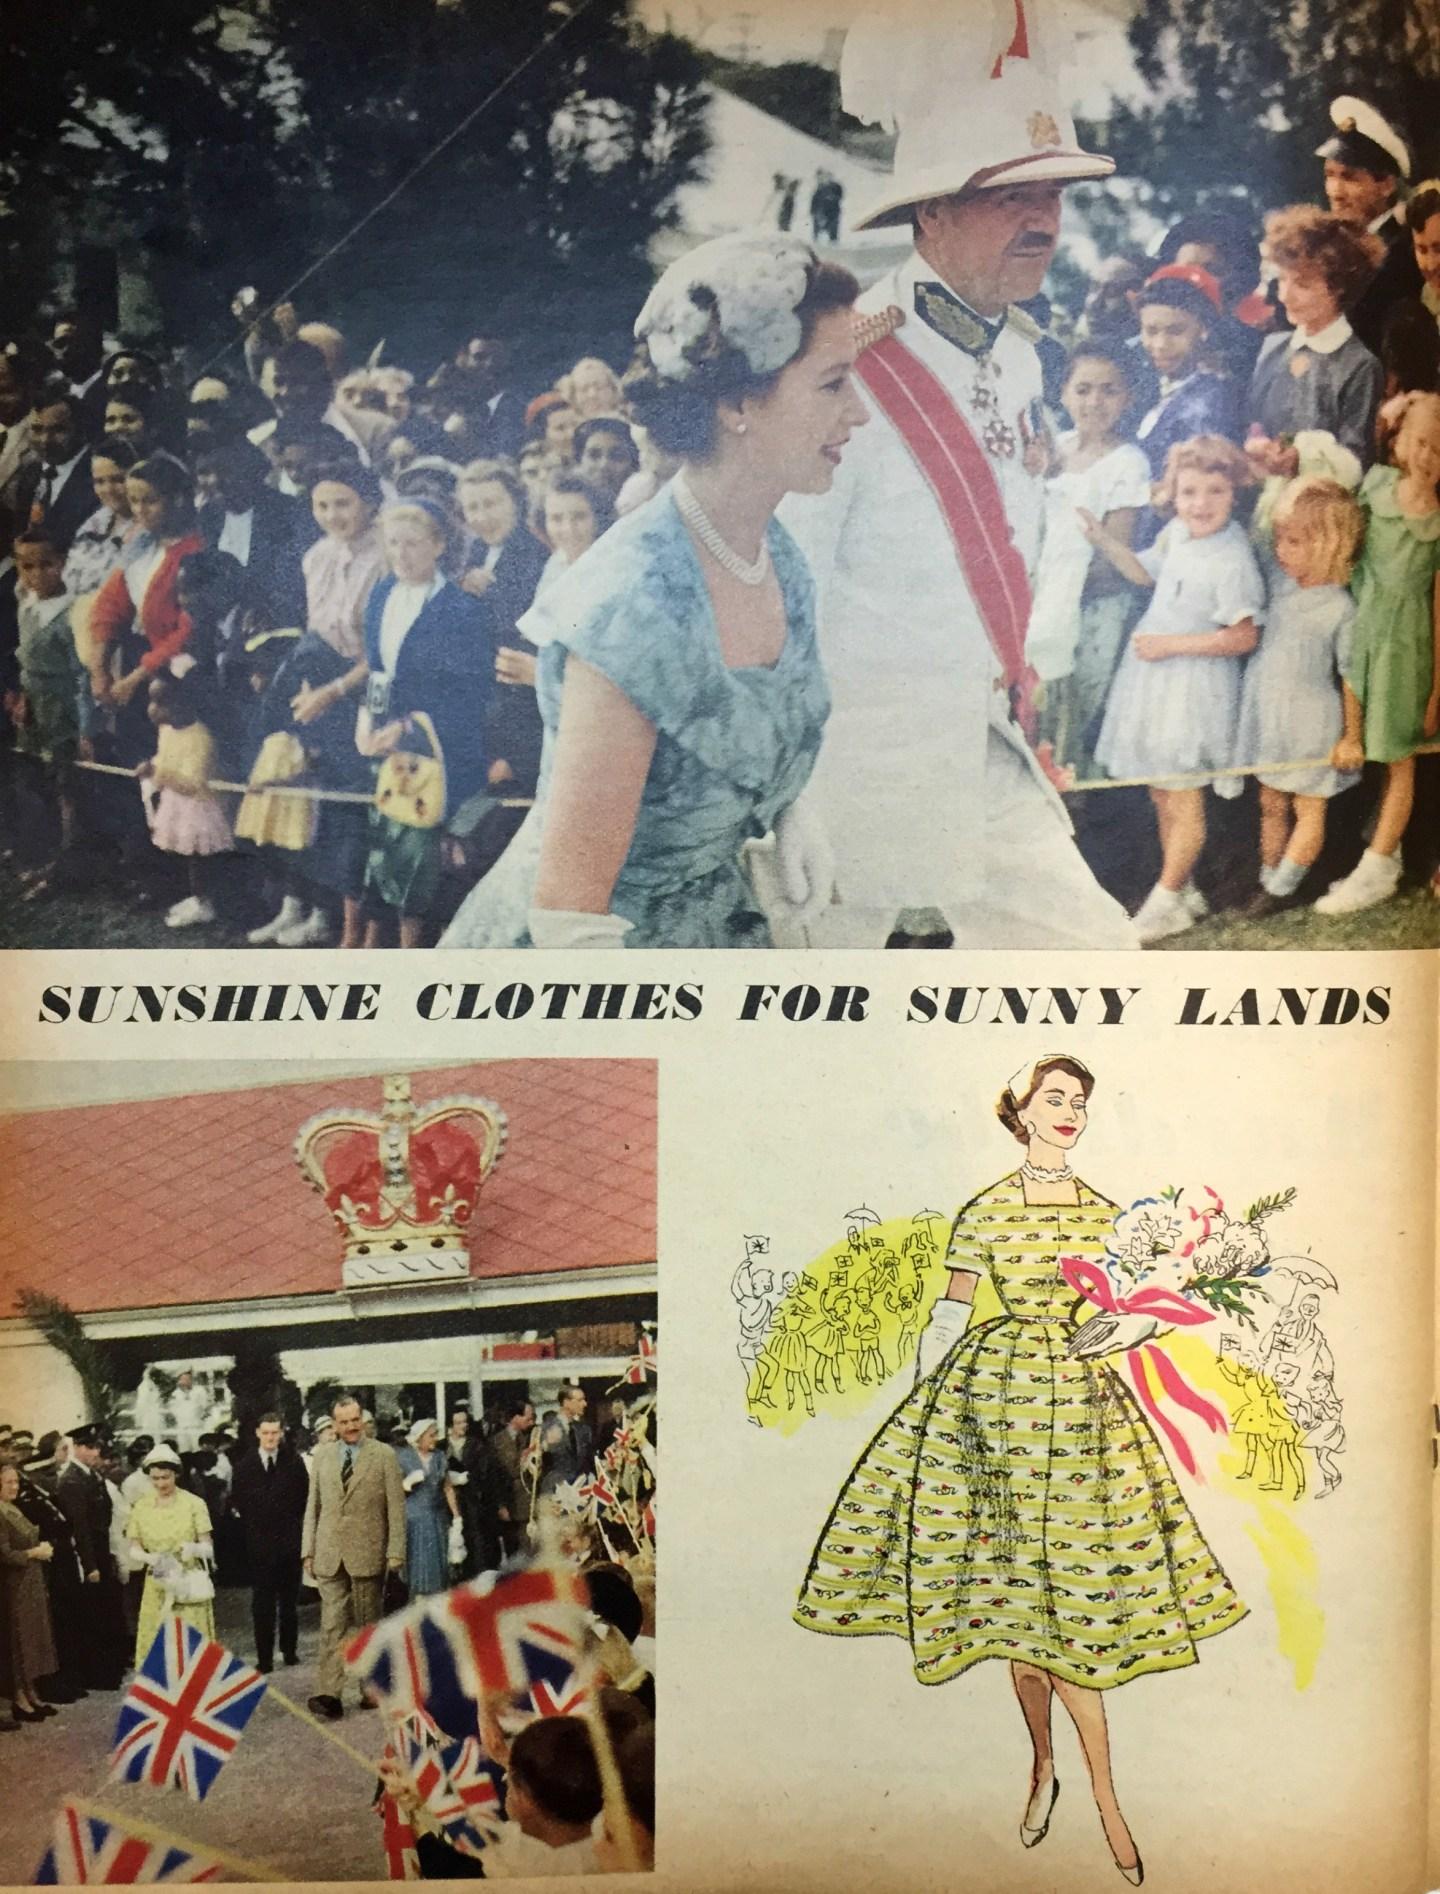 The Queens Royal Tour 1954